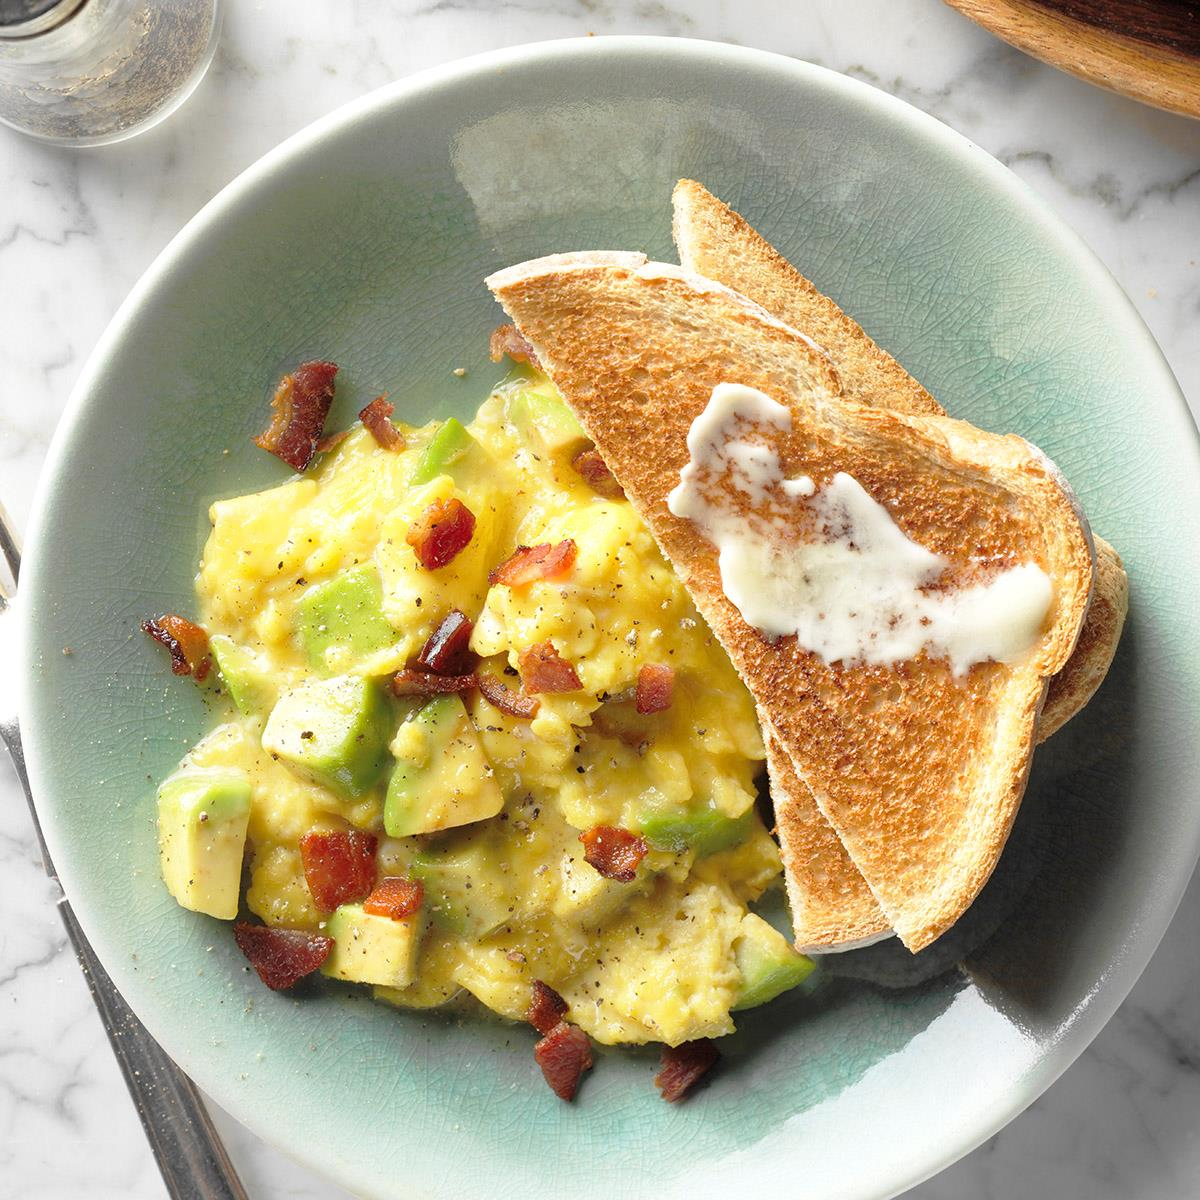 Lunch Ideas Avocado: Avocado Scrambled Eggs Recipe